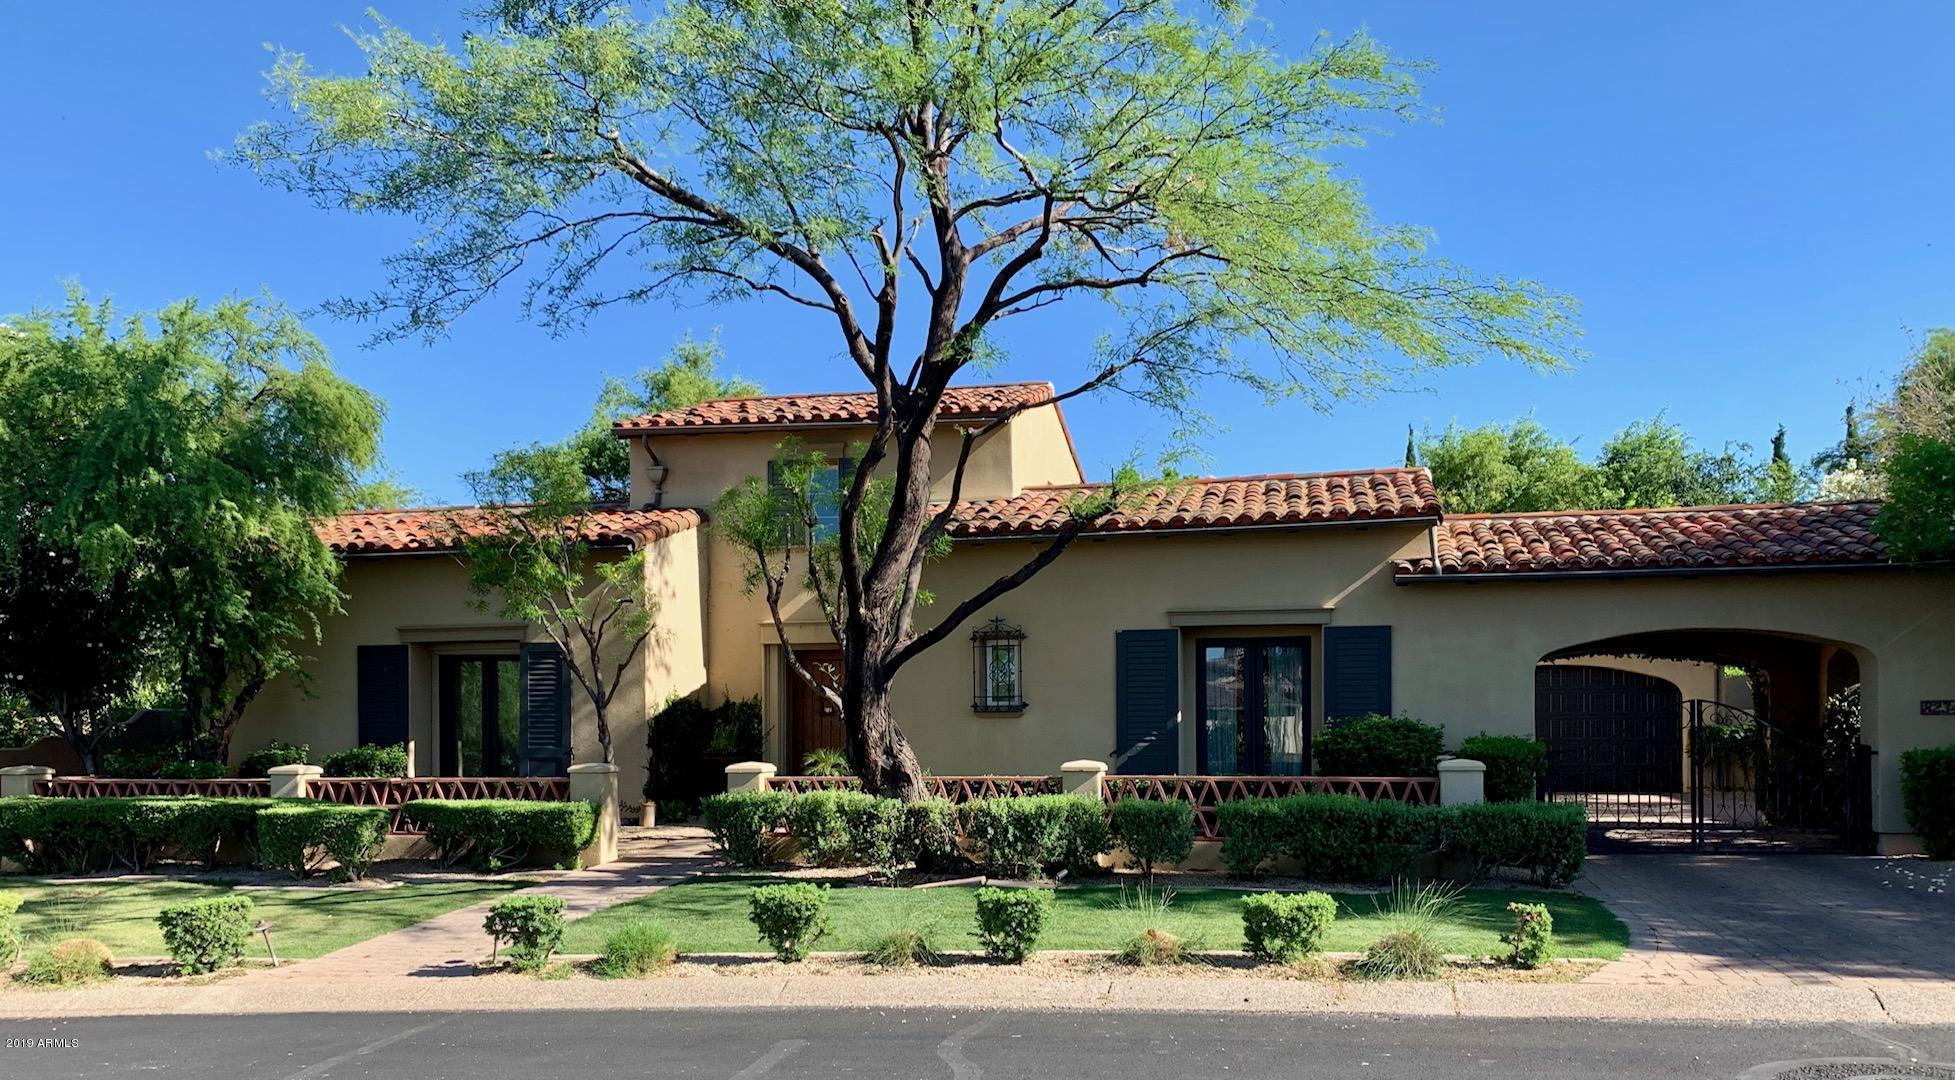 Photo of 8234 E WING SHADOW Road, Scottsdale, AZ 85255